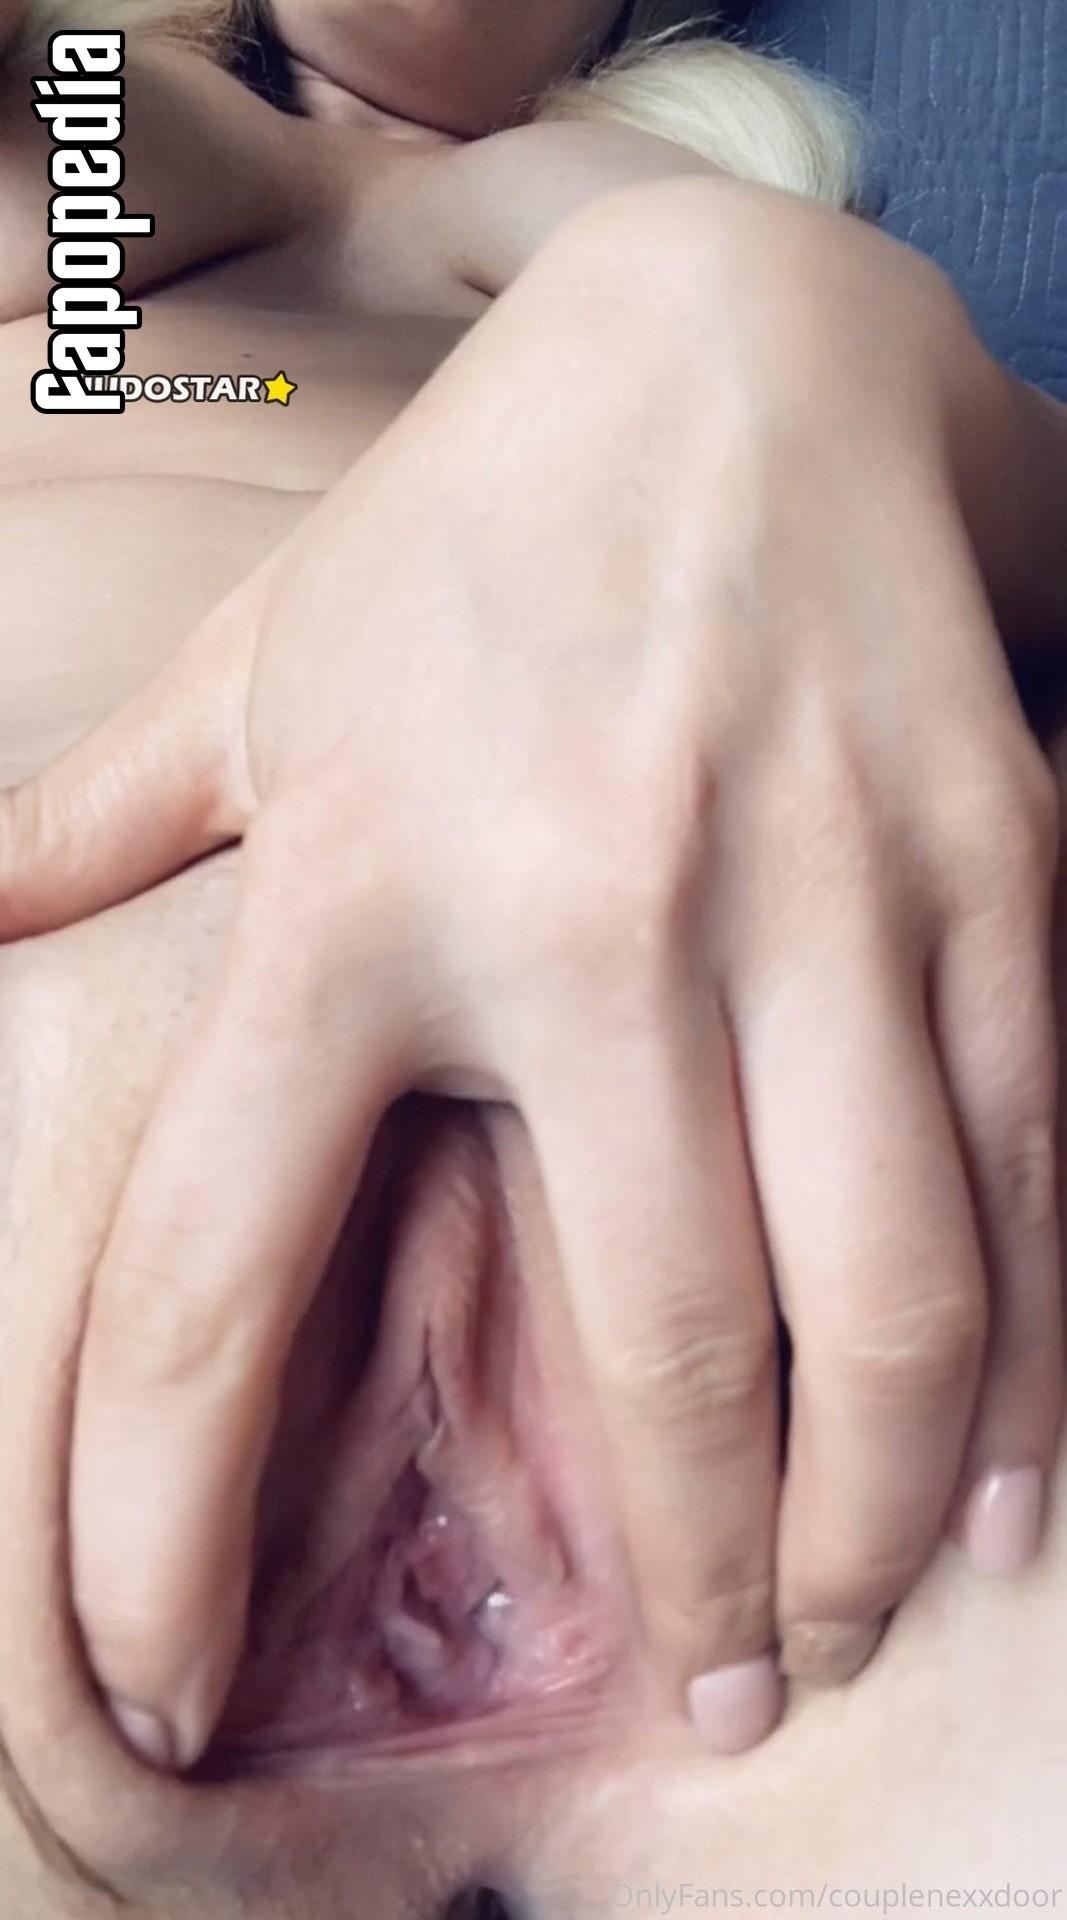 Xxvanessaxxof Nude OnlyFans Leaks